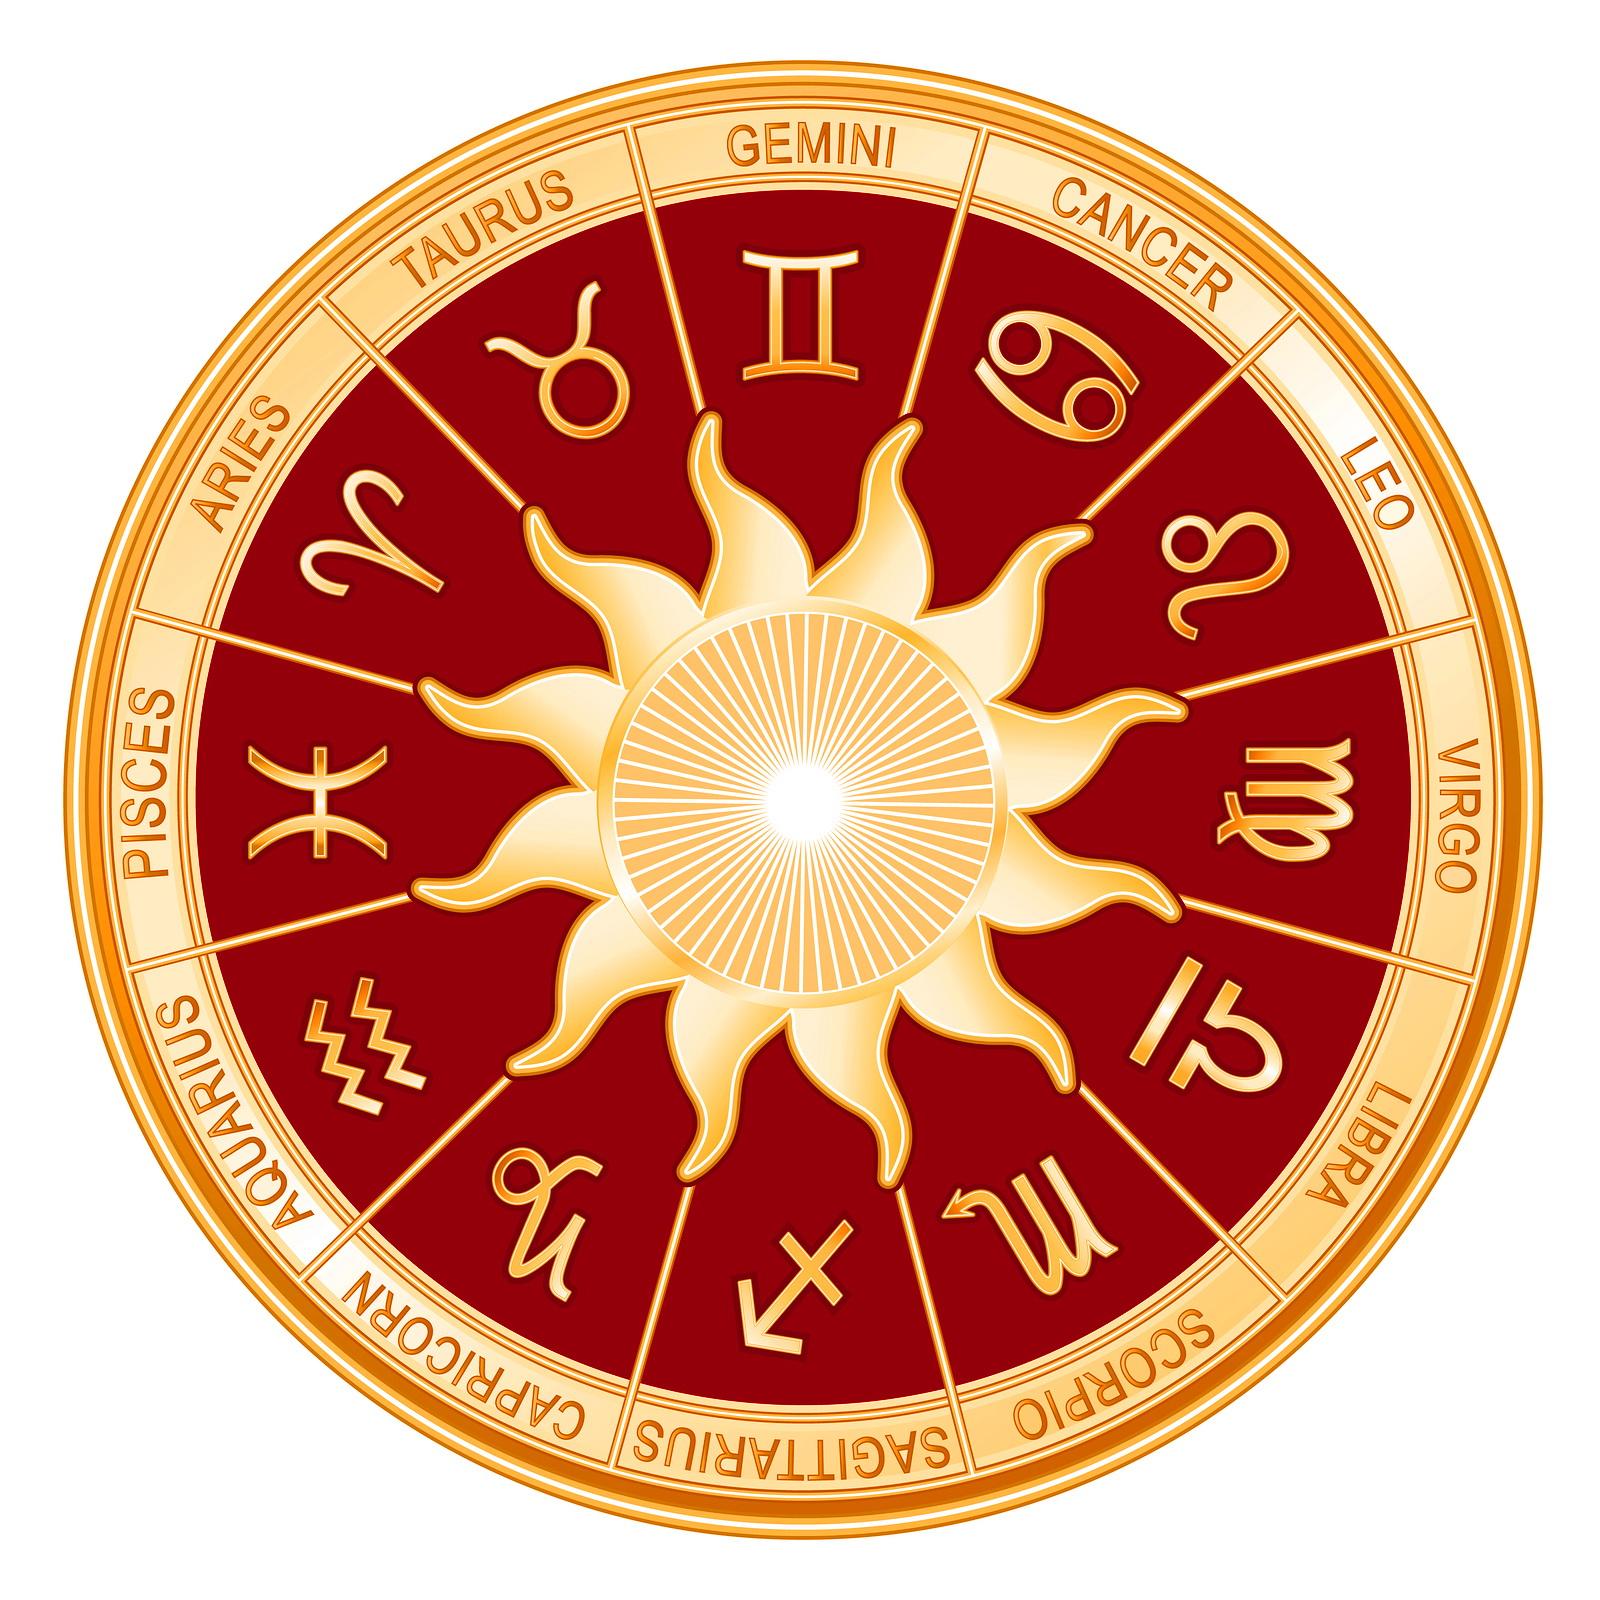 Horoscope for August 19, 2021- ਜਾਣੋ ਅੱਜ ਰਾਸ਼ੀਫਲ ਵਿੱਚ ਤੁਹਾਡੇ ਲਈ ਕੀ ਕੁਝ ਹੈ ਖਾਸ